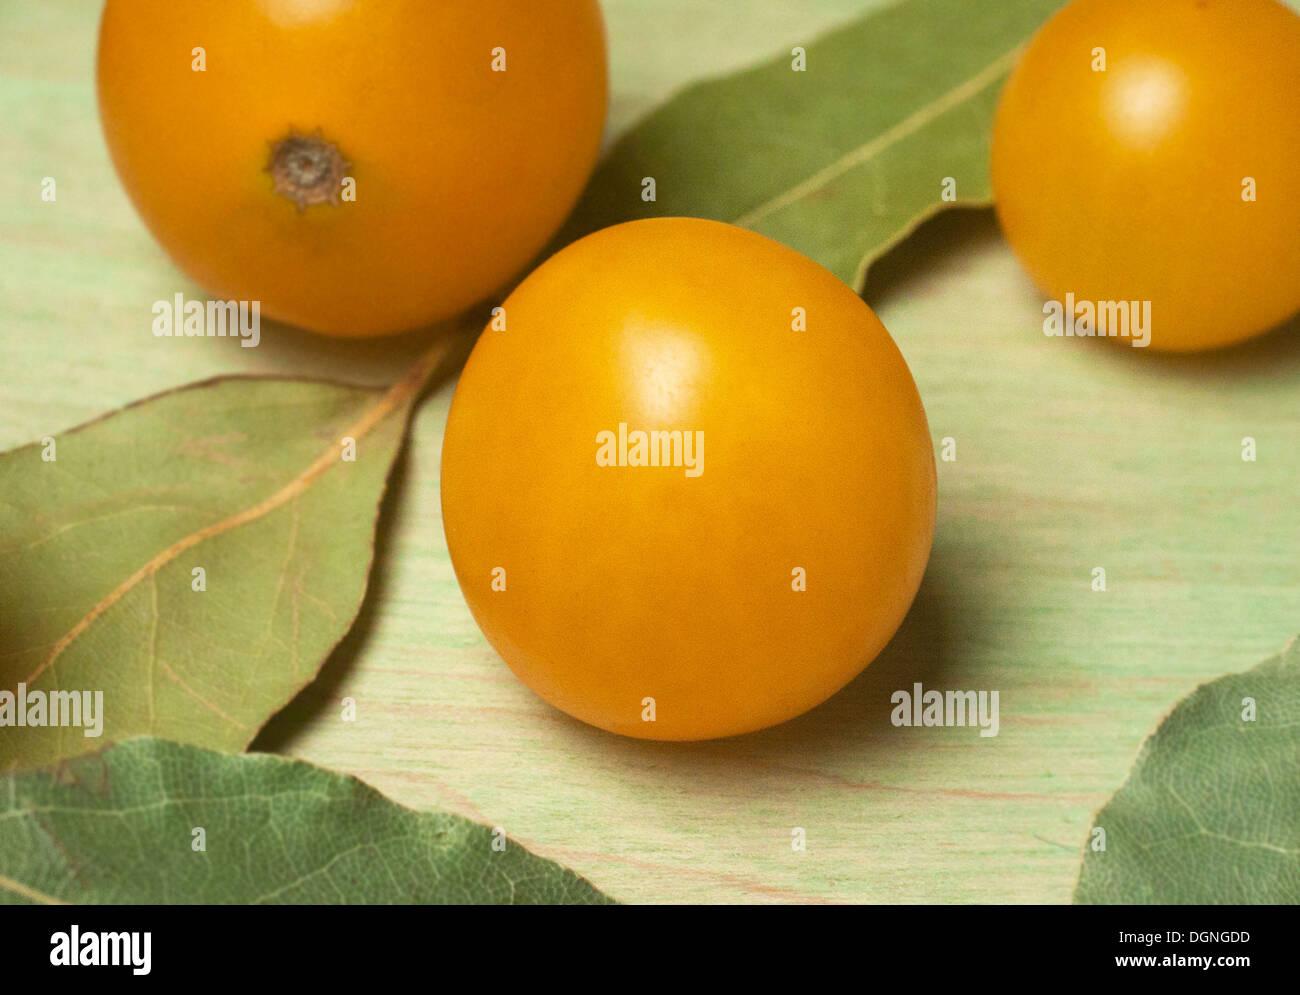 Tomates raisin jaune close up Photo Stock